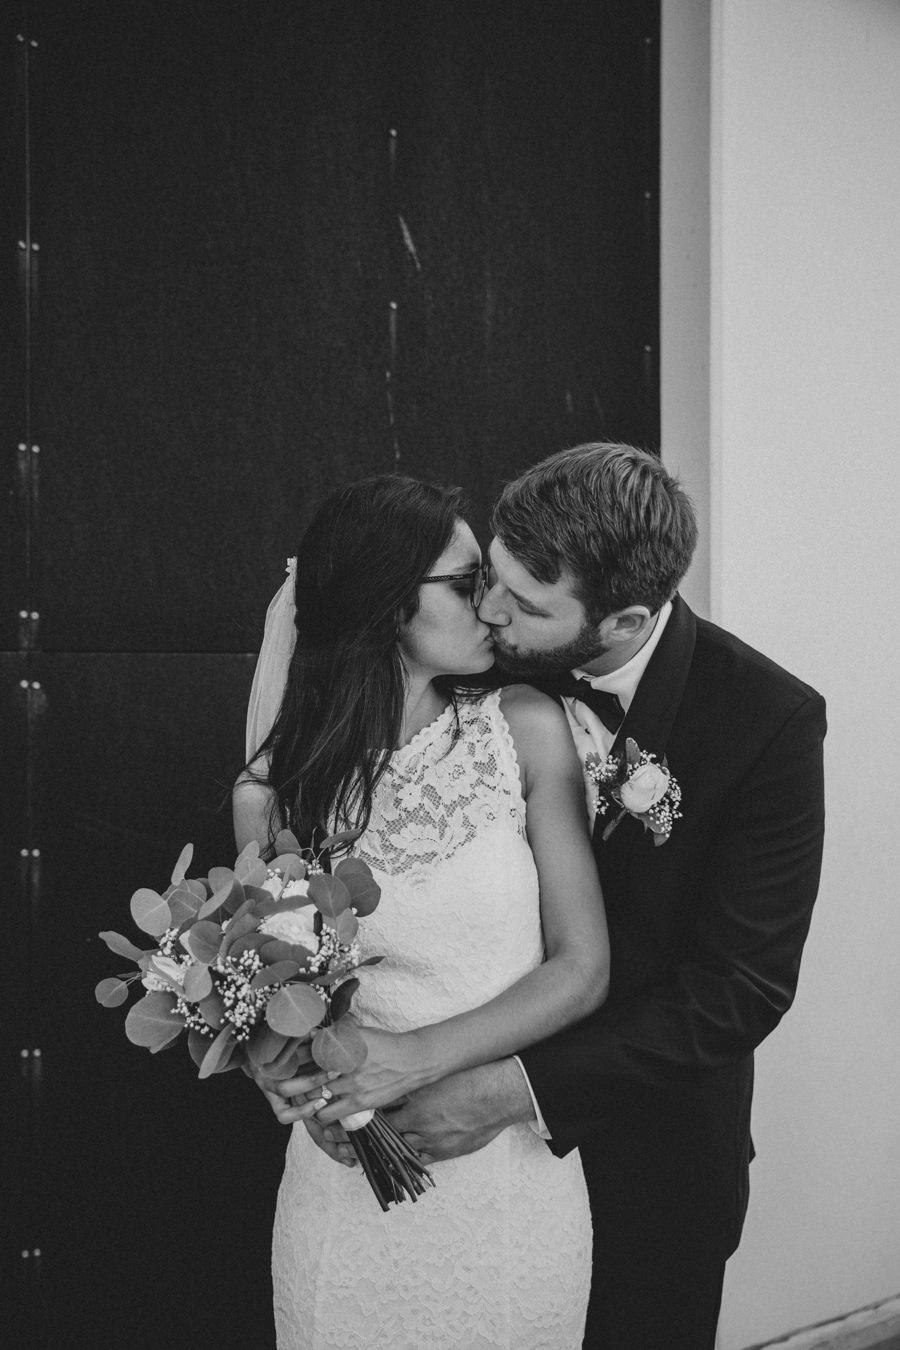 Tampa Heights Industrial Wedding at Cavu Emmy RJ-113.jpg